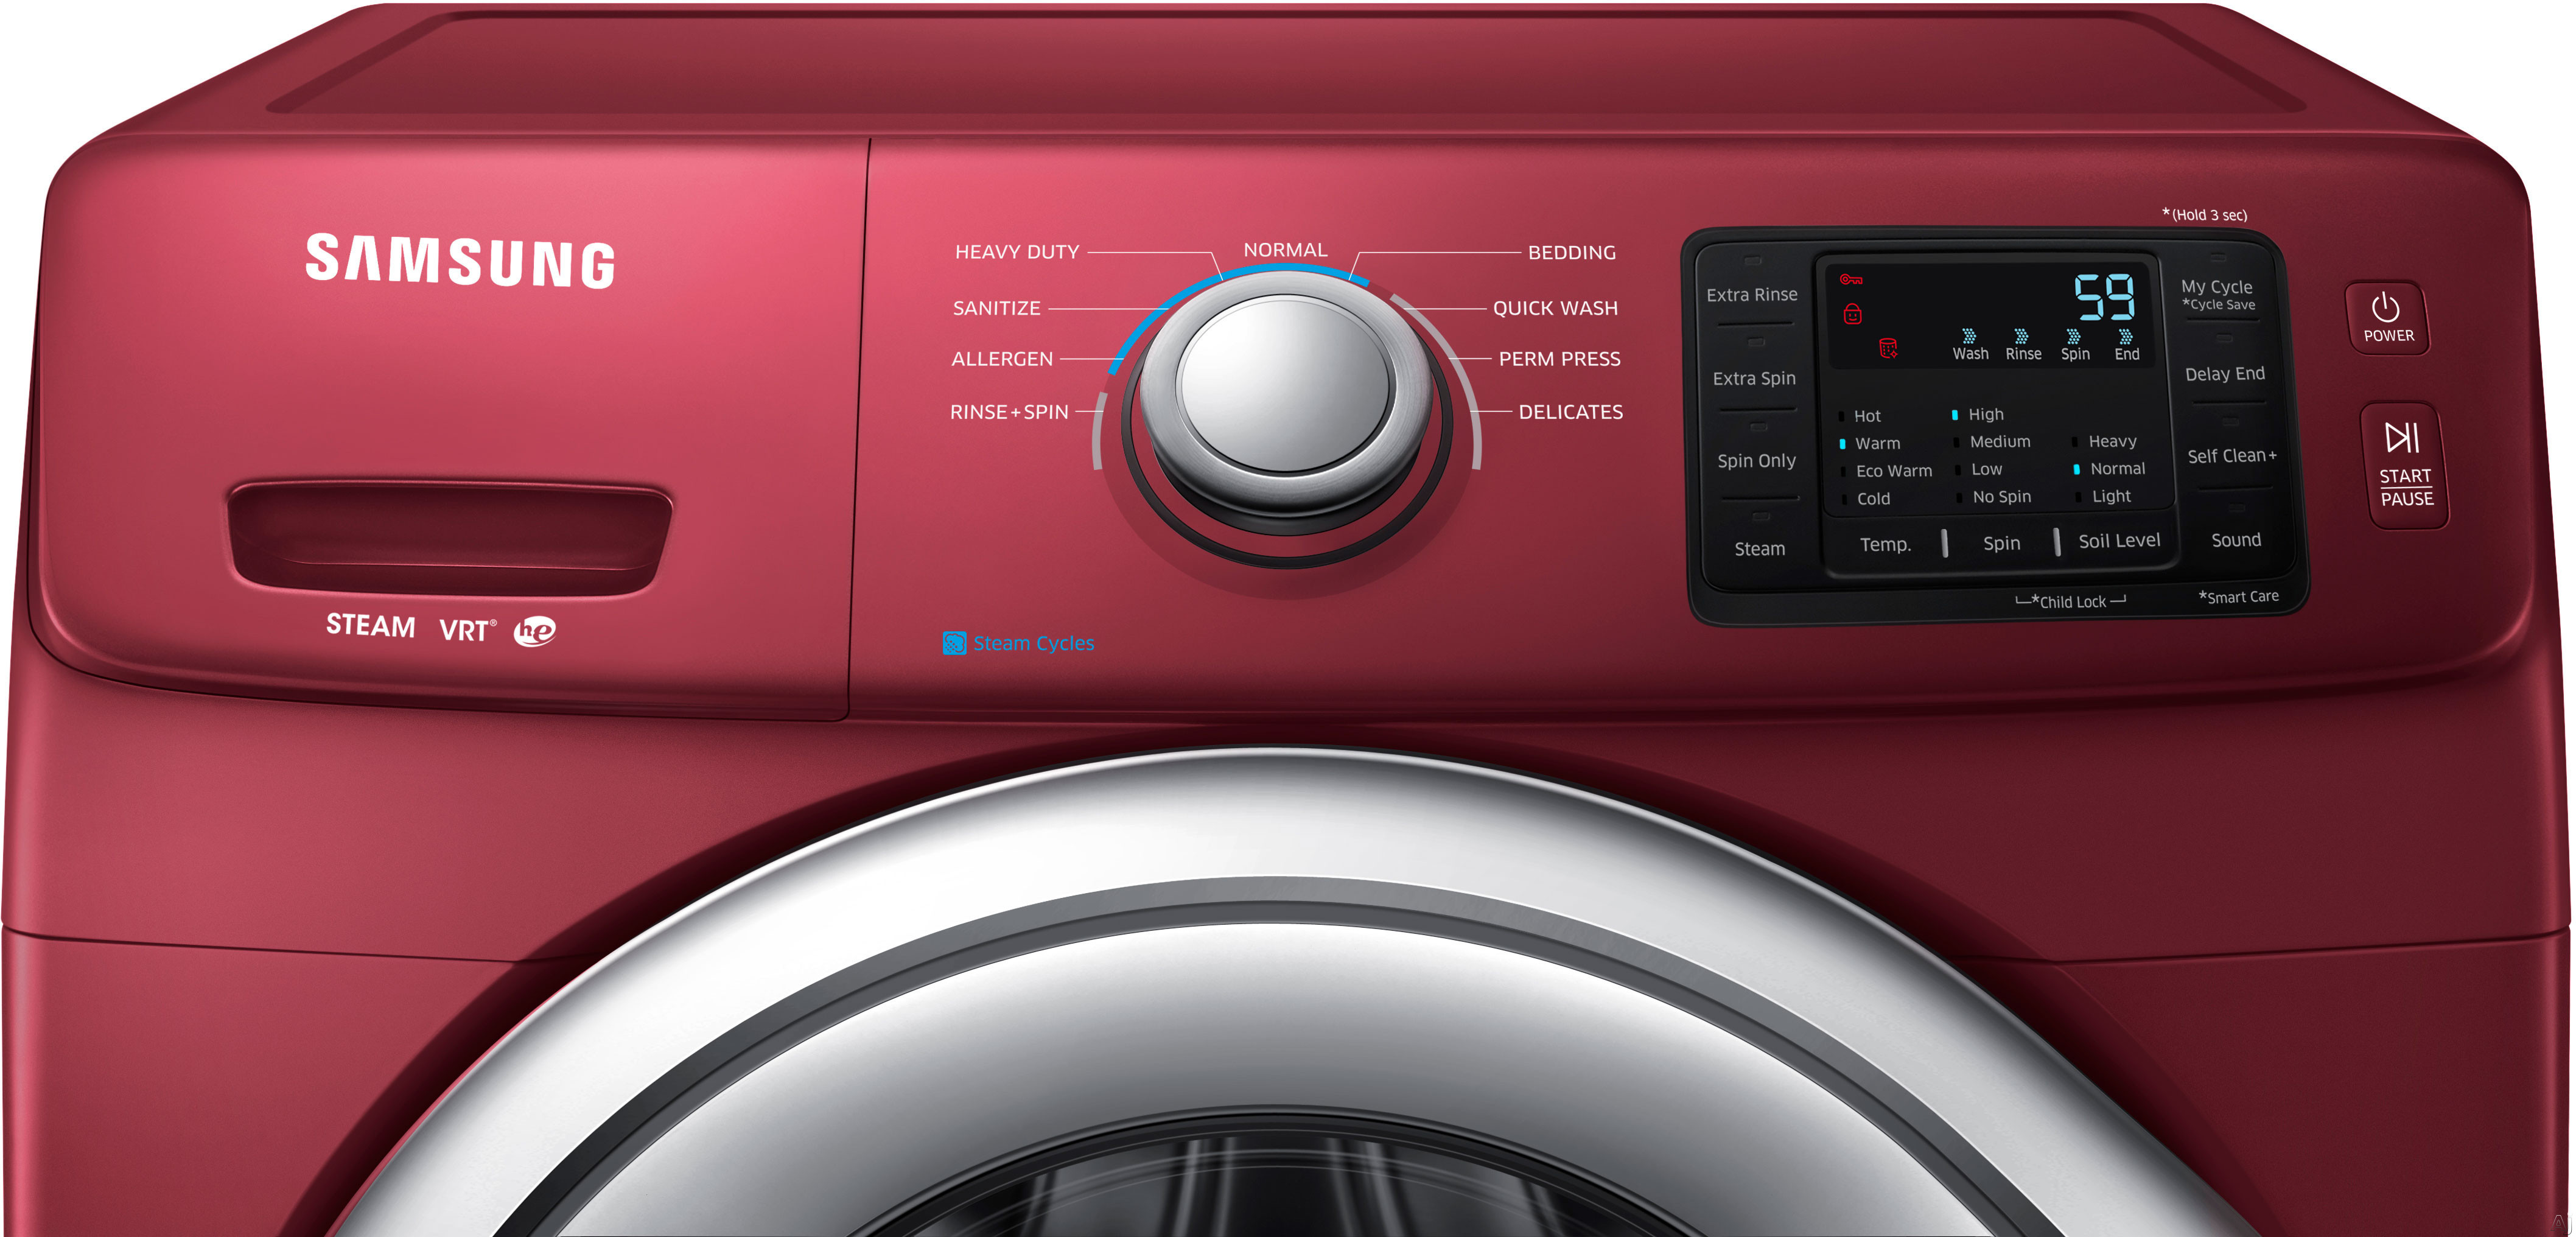 Samsung Wf42h5200af 27 Quot Front Load Washer With 4 2 Cu Ft